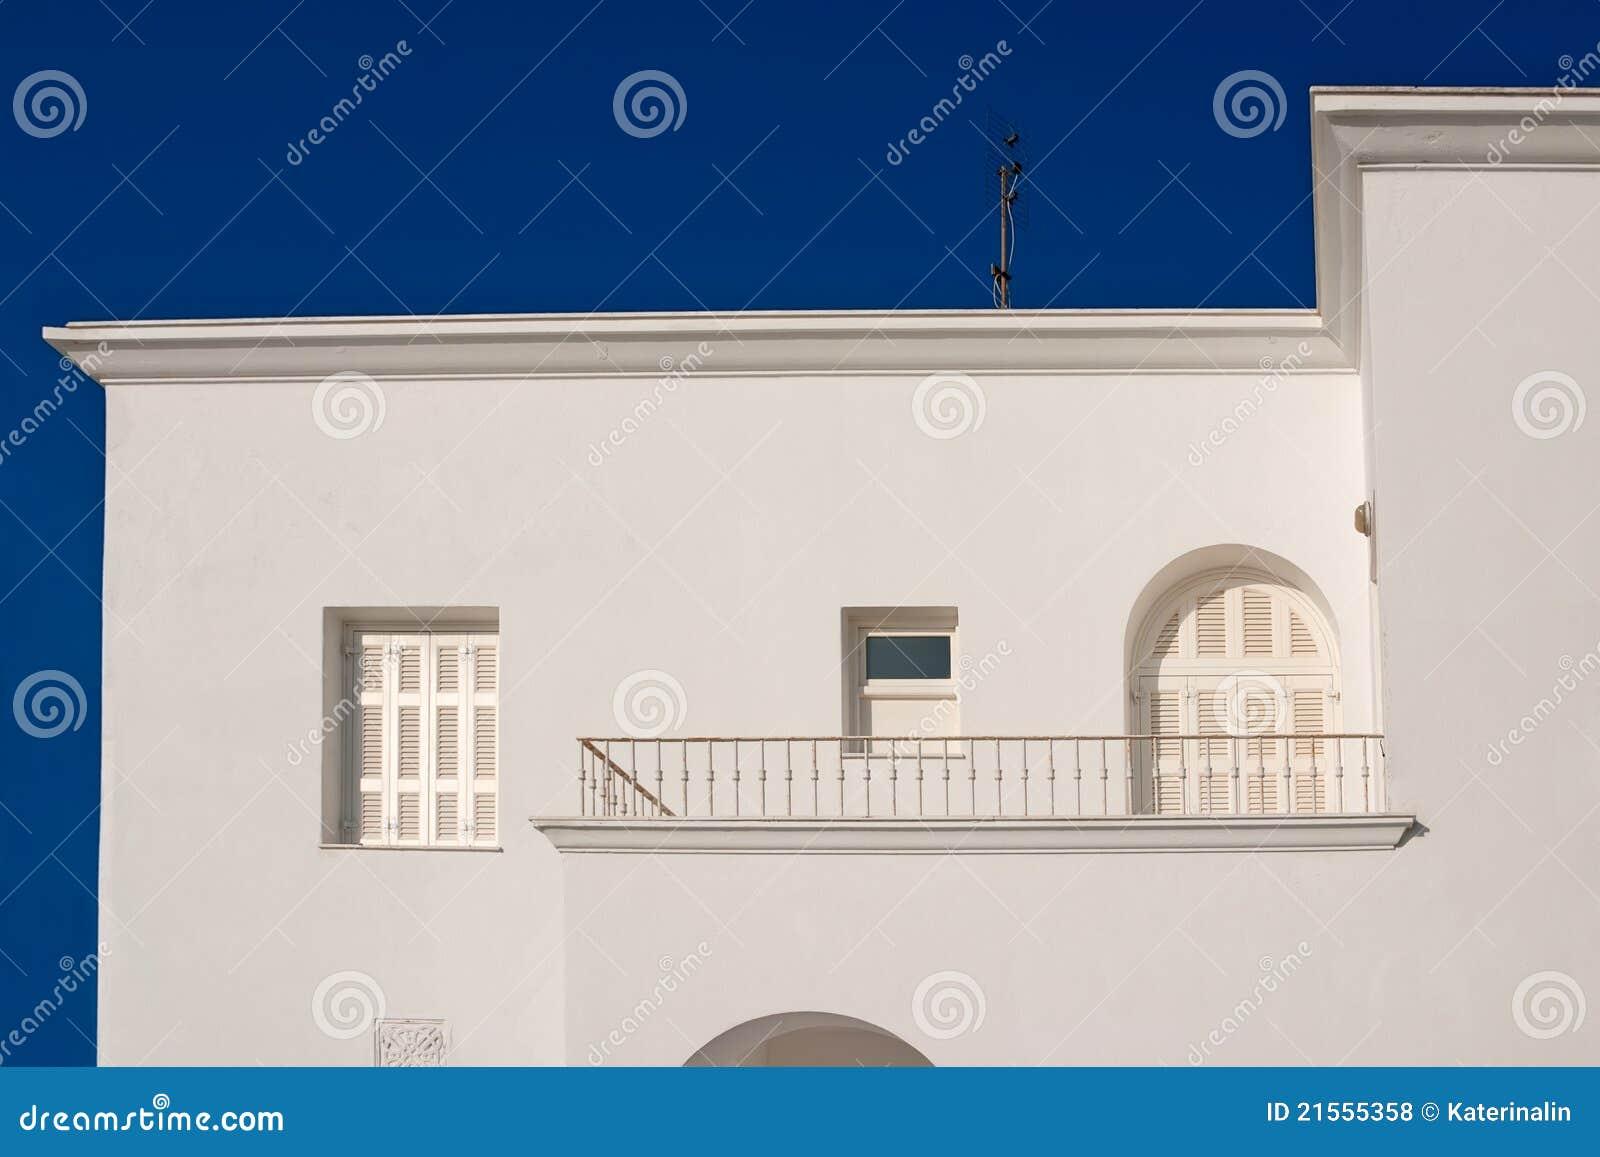 white house santorini - photo #32